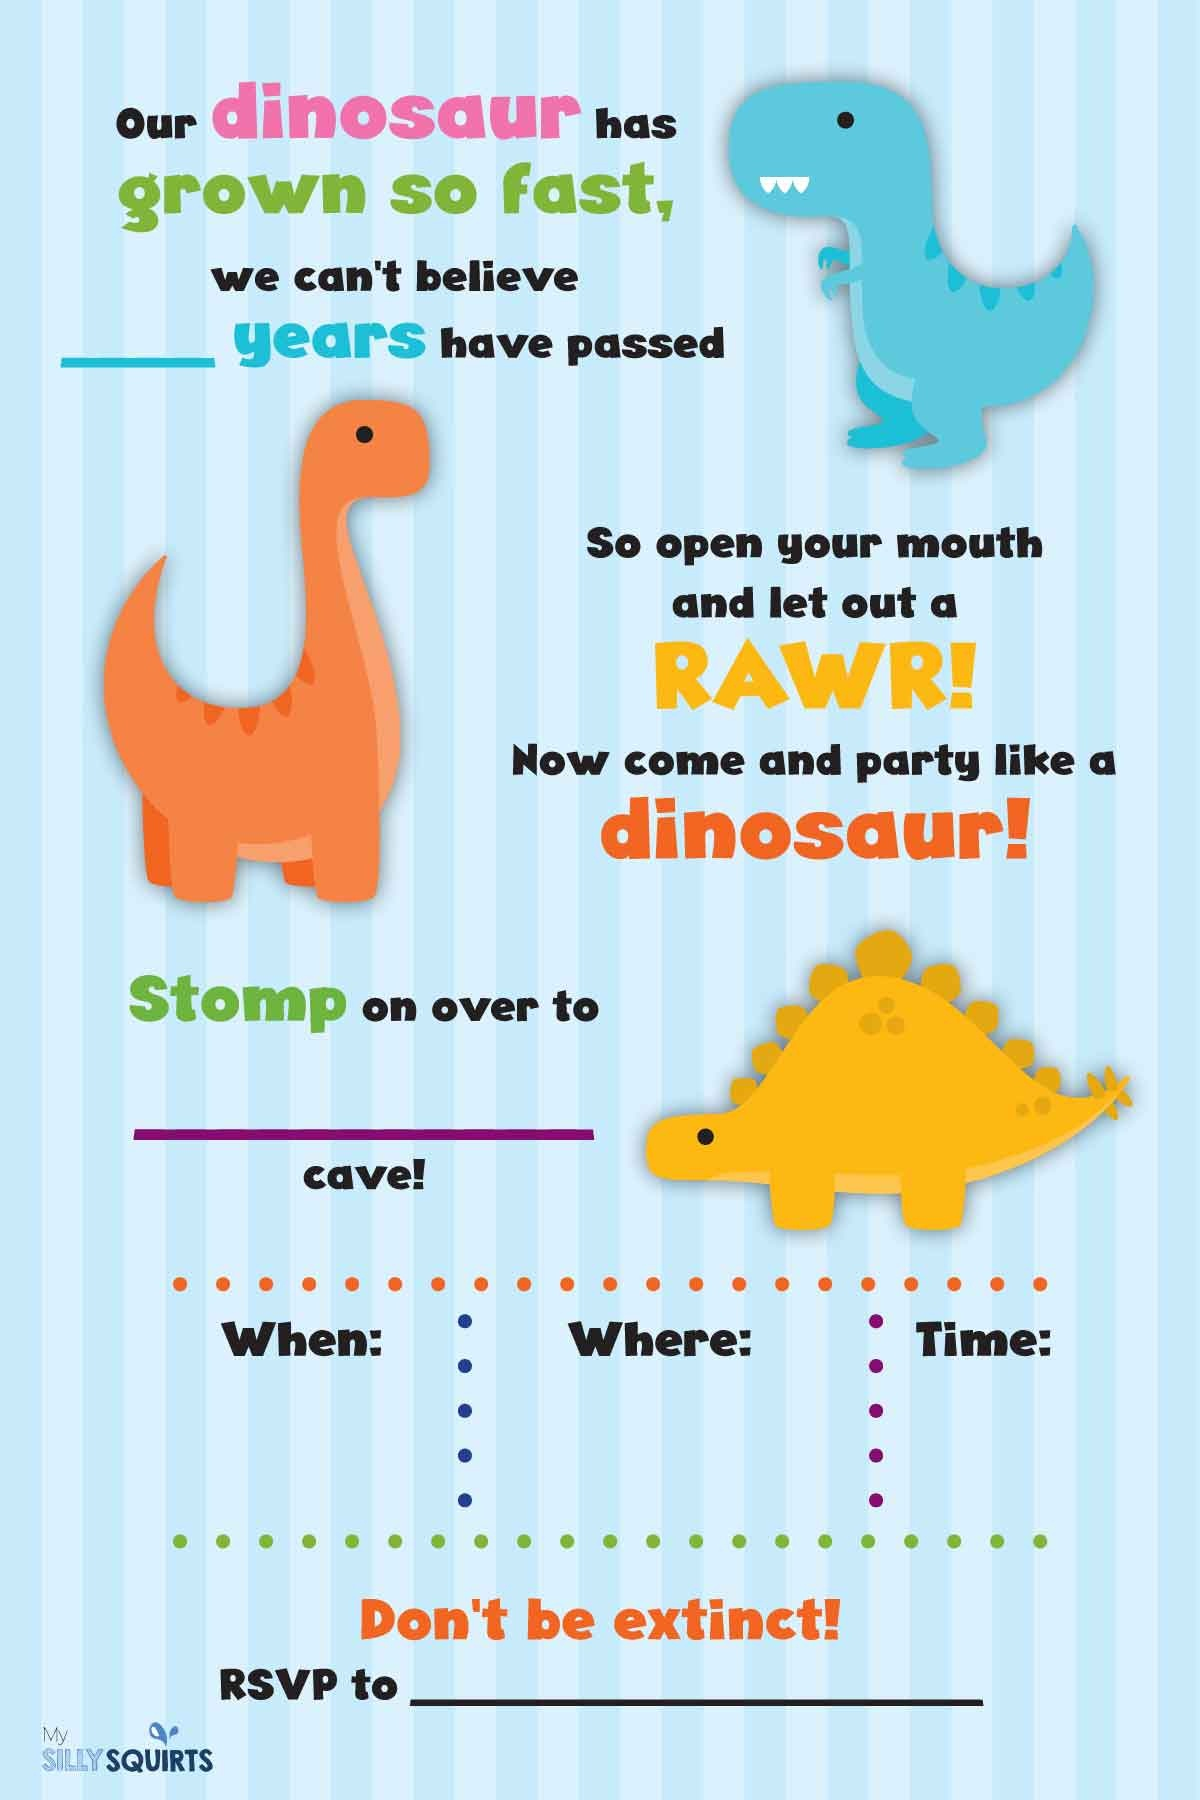 Rawr! Free Dinosaur Birthday Party Printables | My Silly Squirts - Free Printable Dinosaur Birthday Invitations